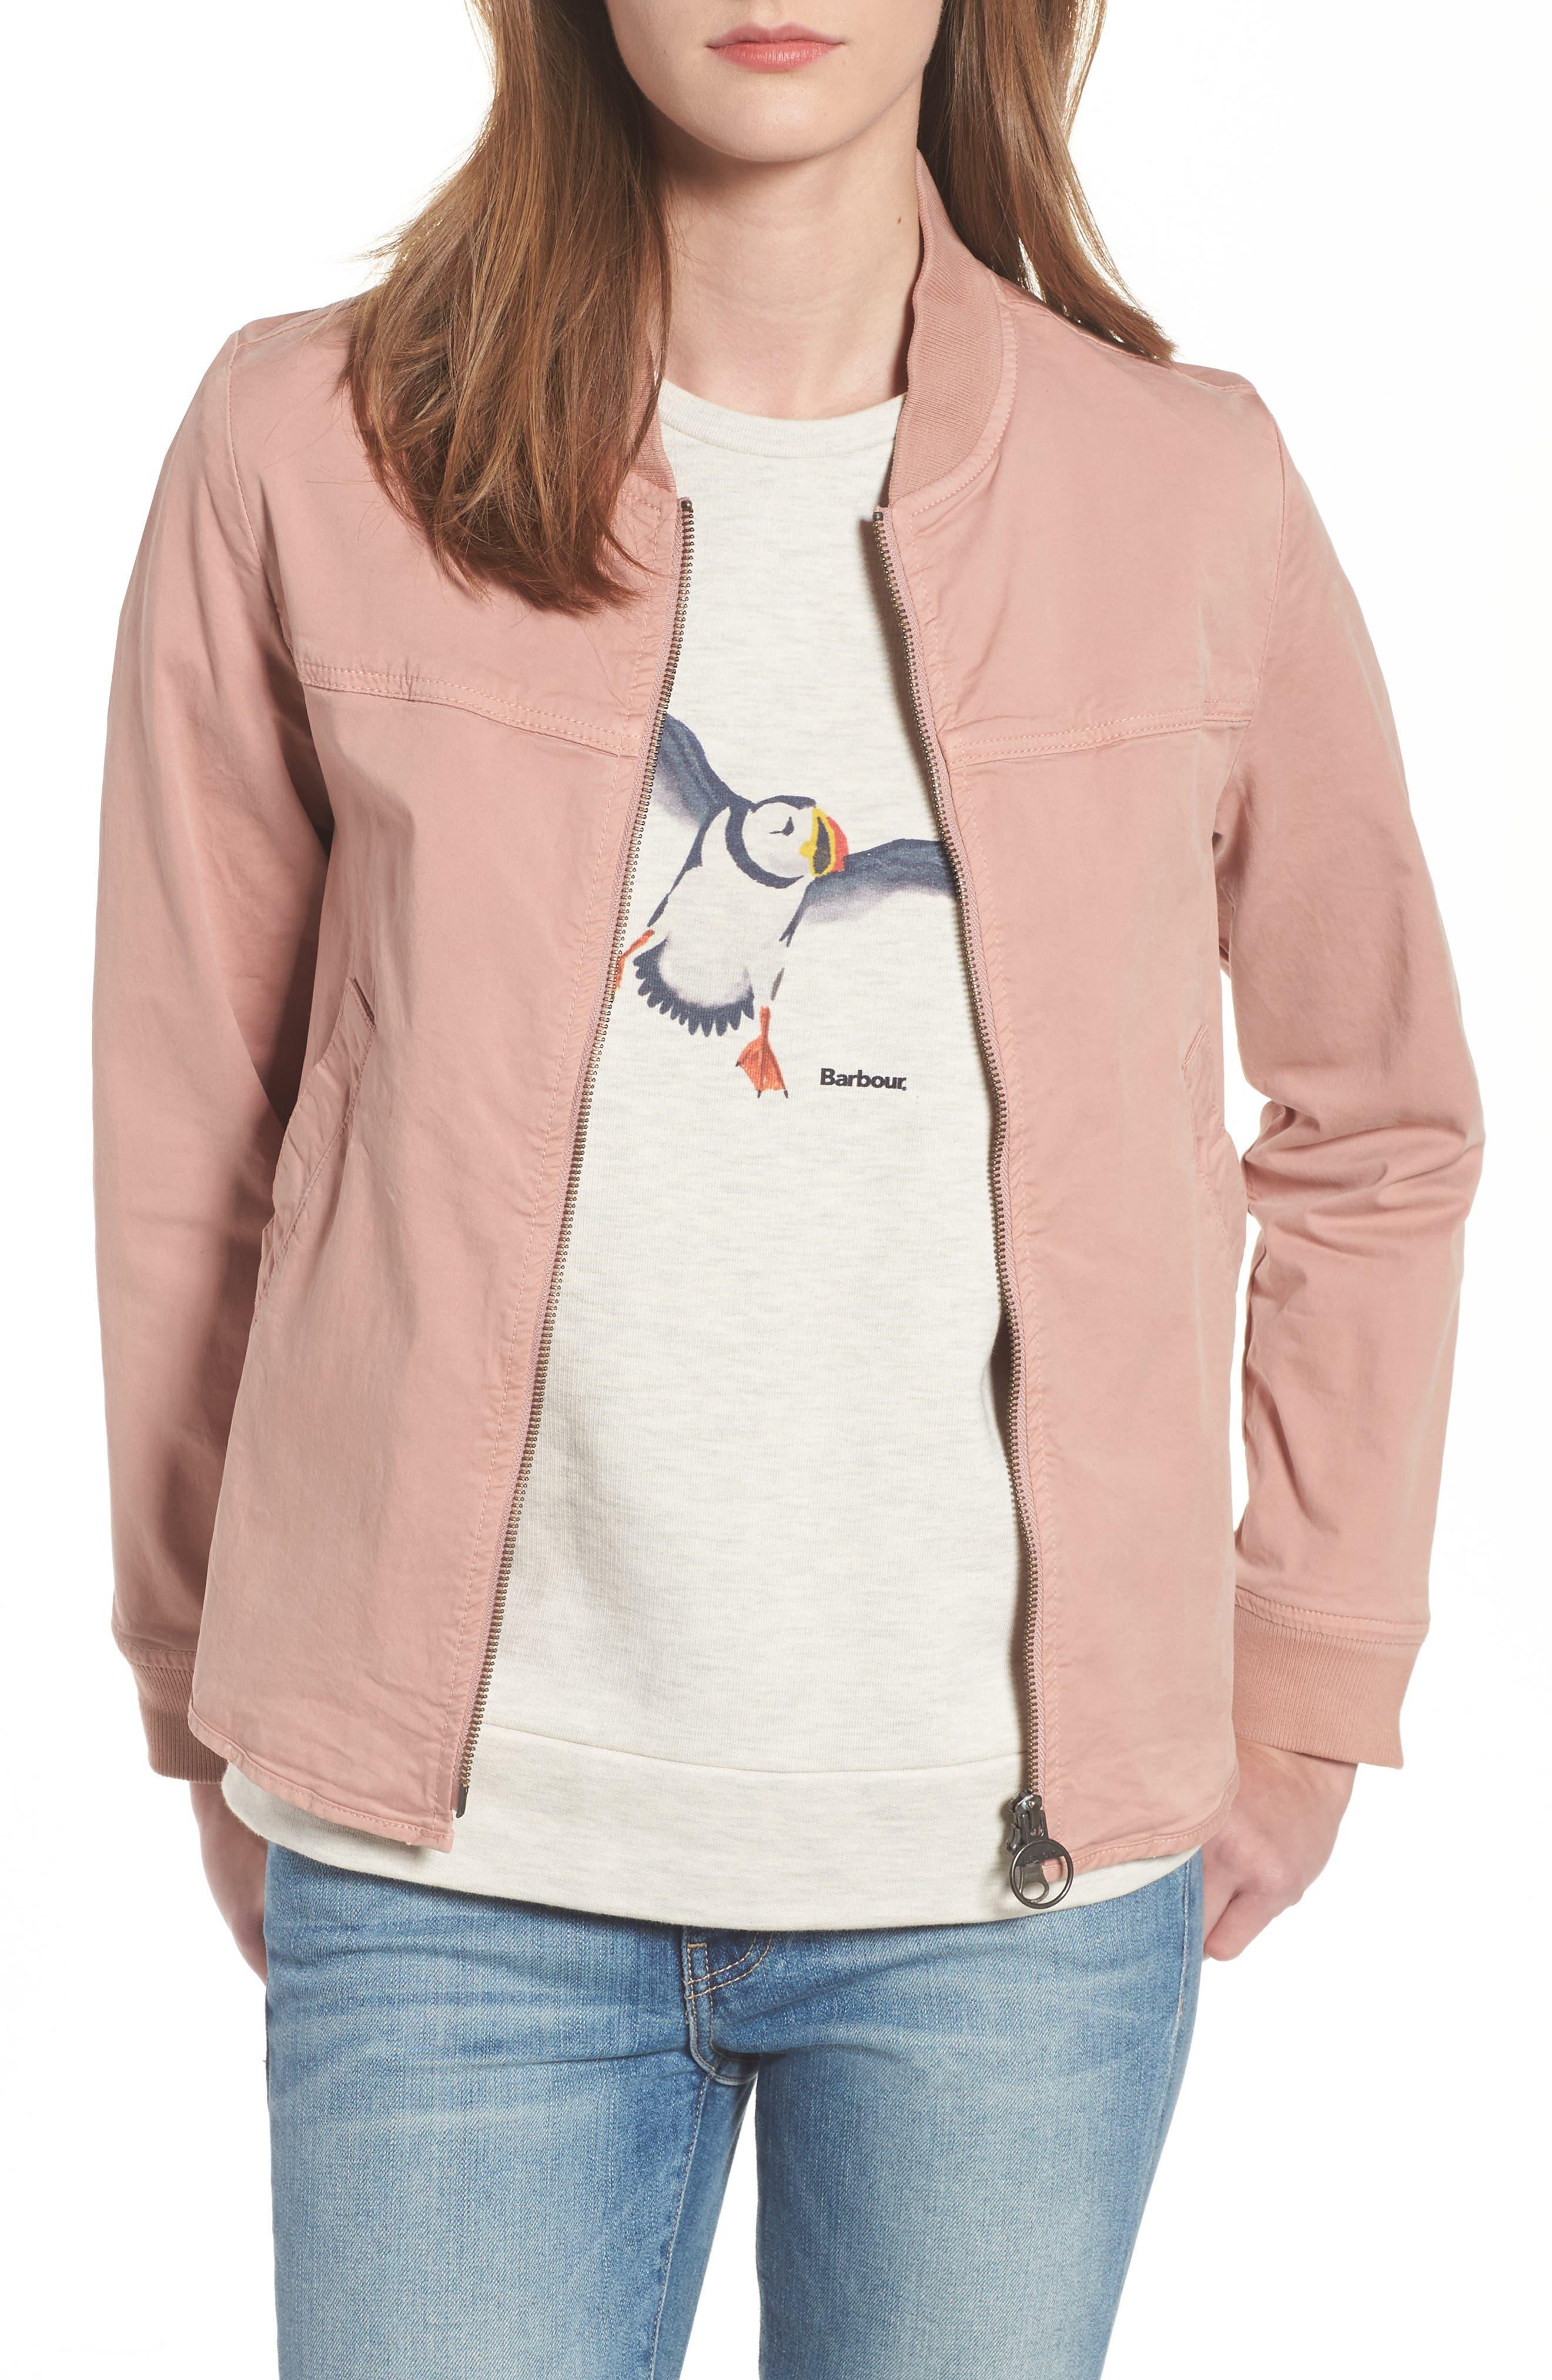 Barbour Mabel Overshirt Jacket